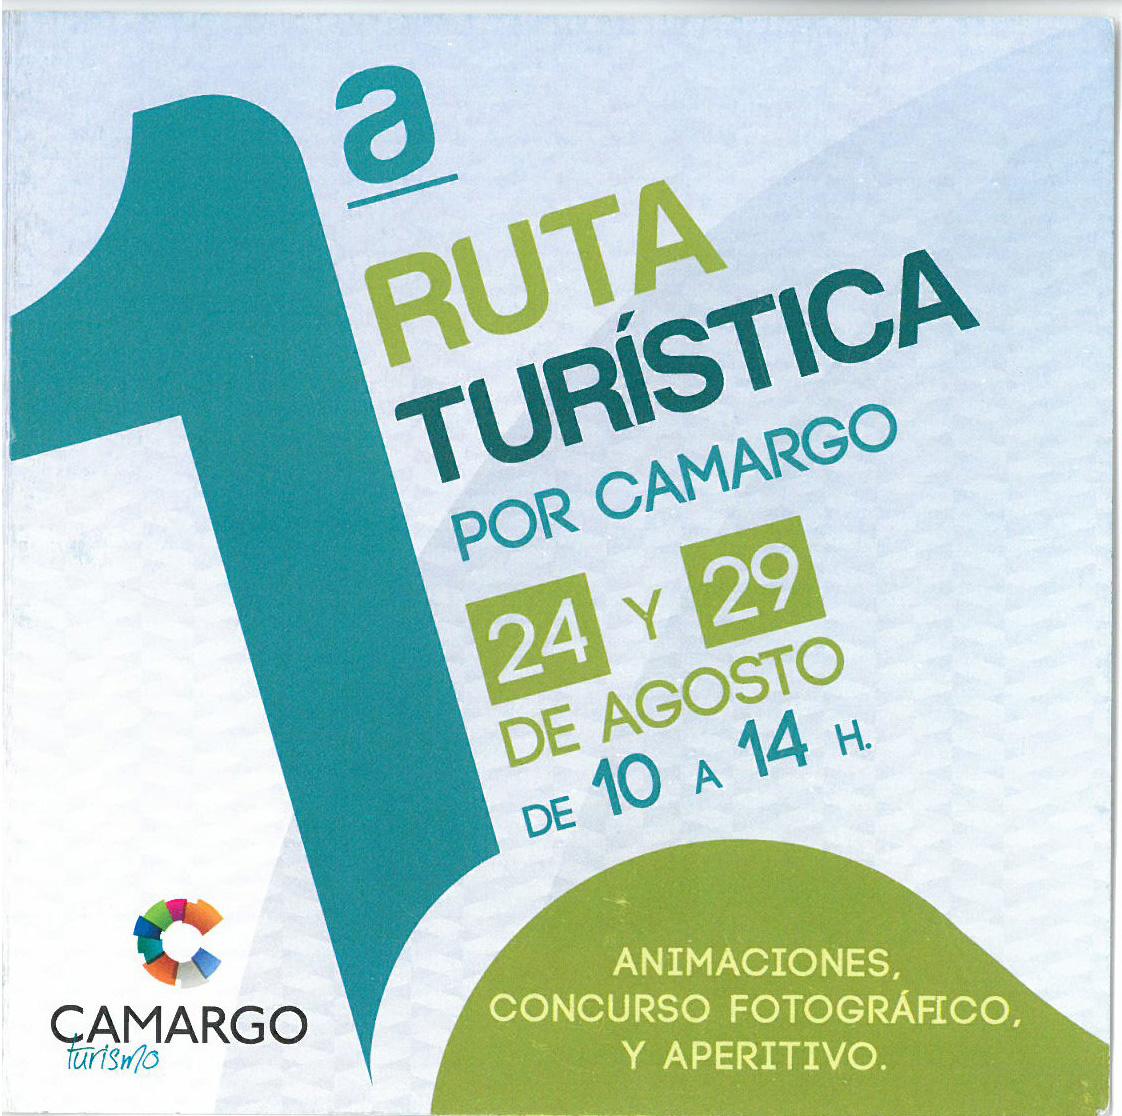 1ª Ruta turística por Camargo